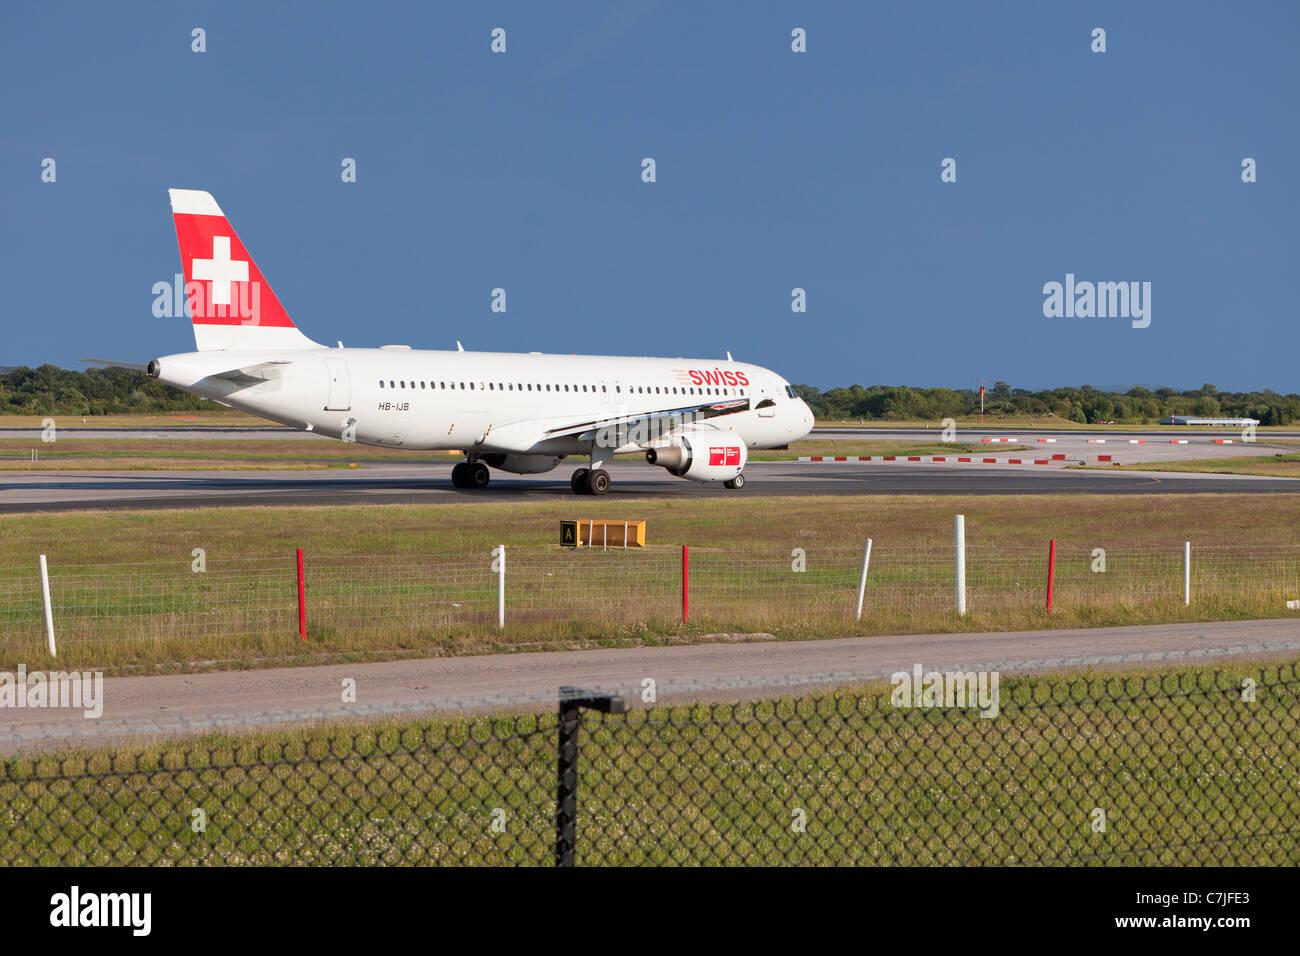 Swiss air aircraft, England - Stock Image